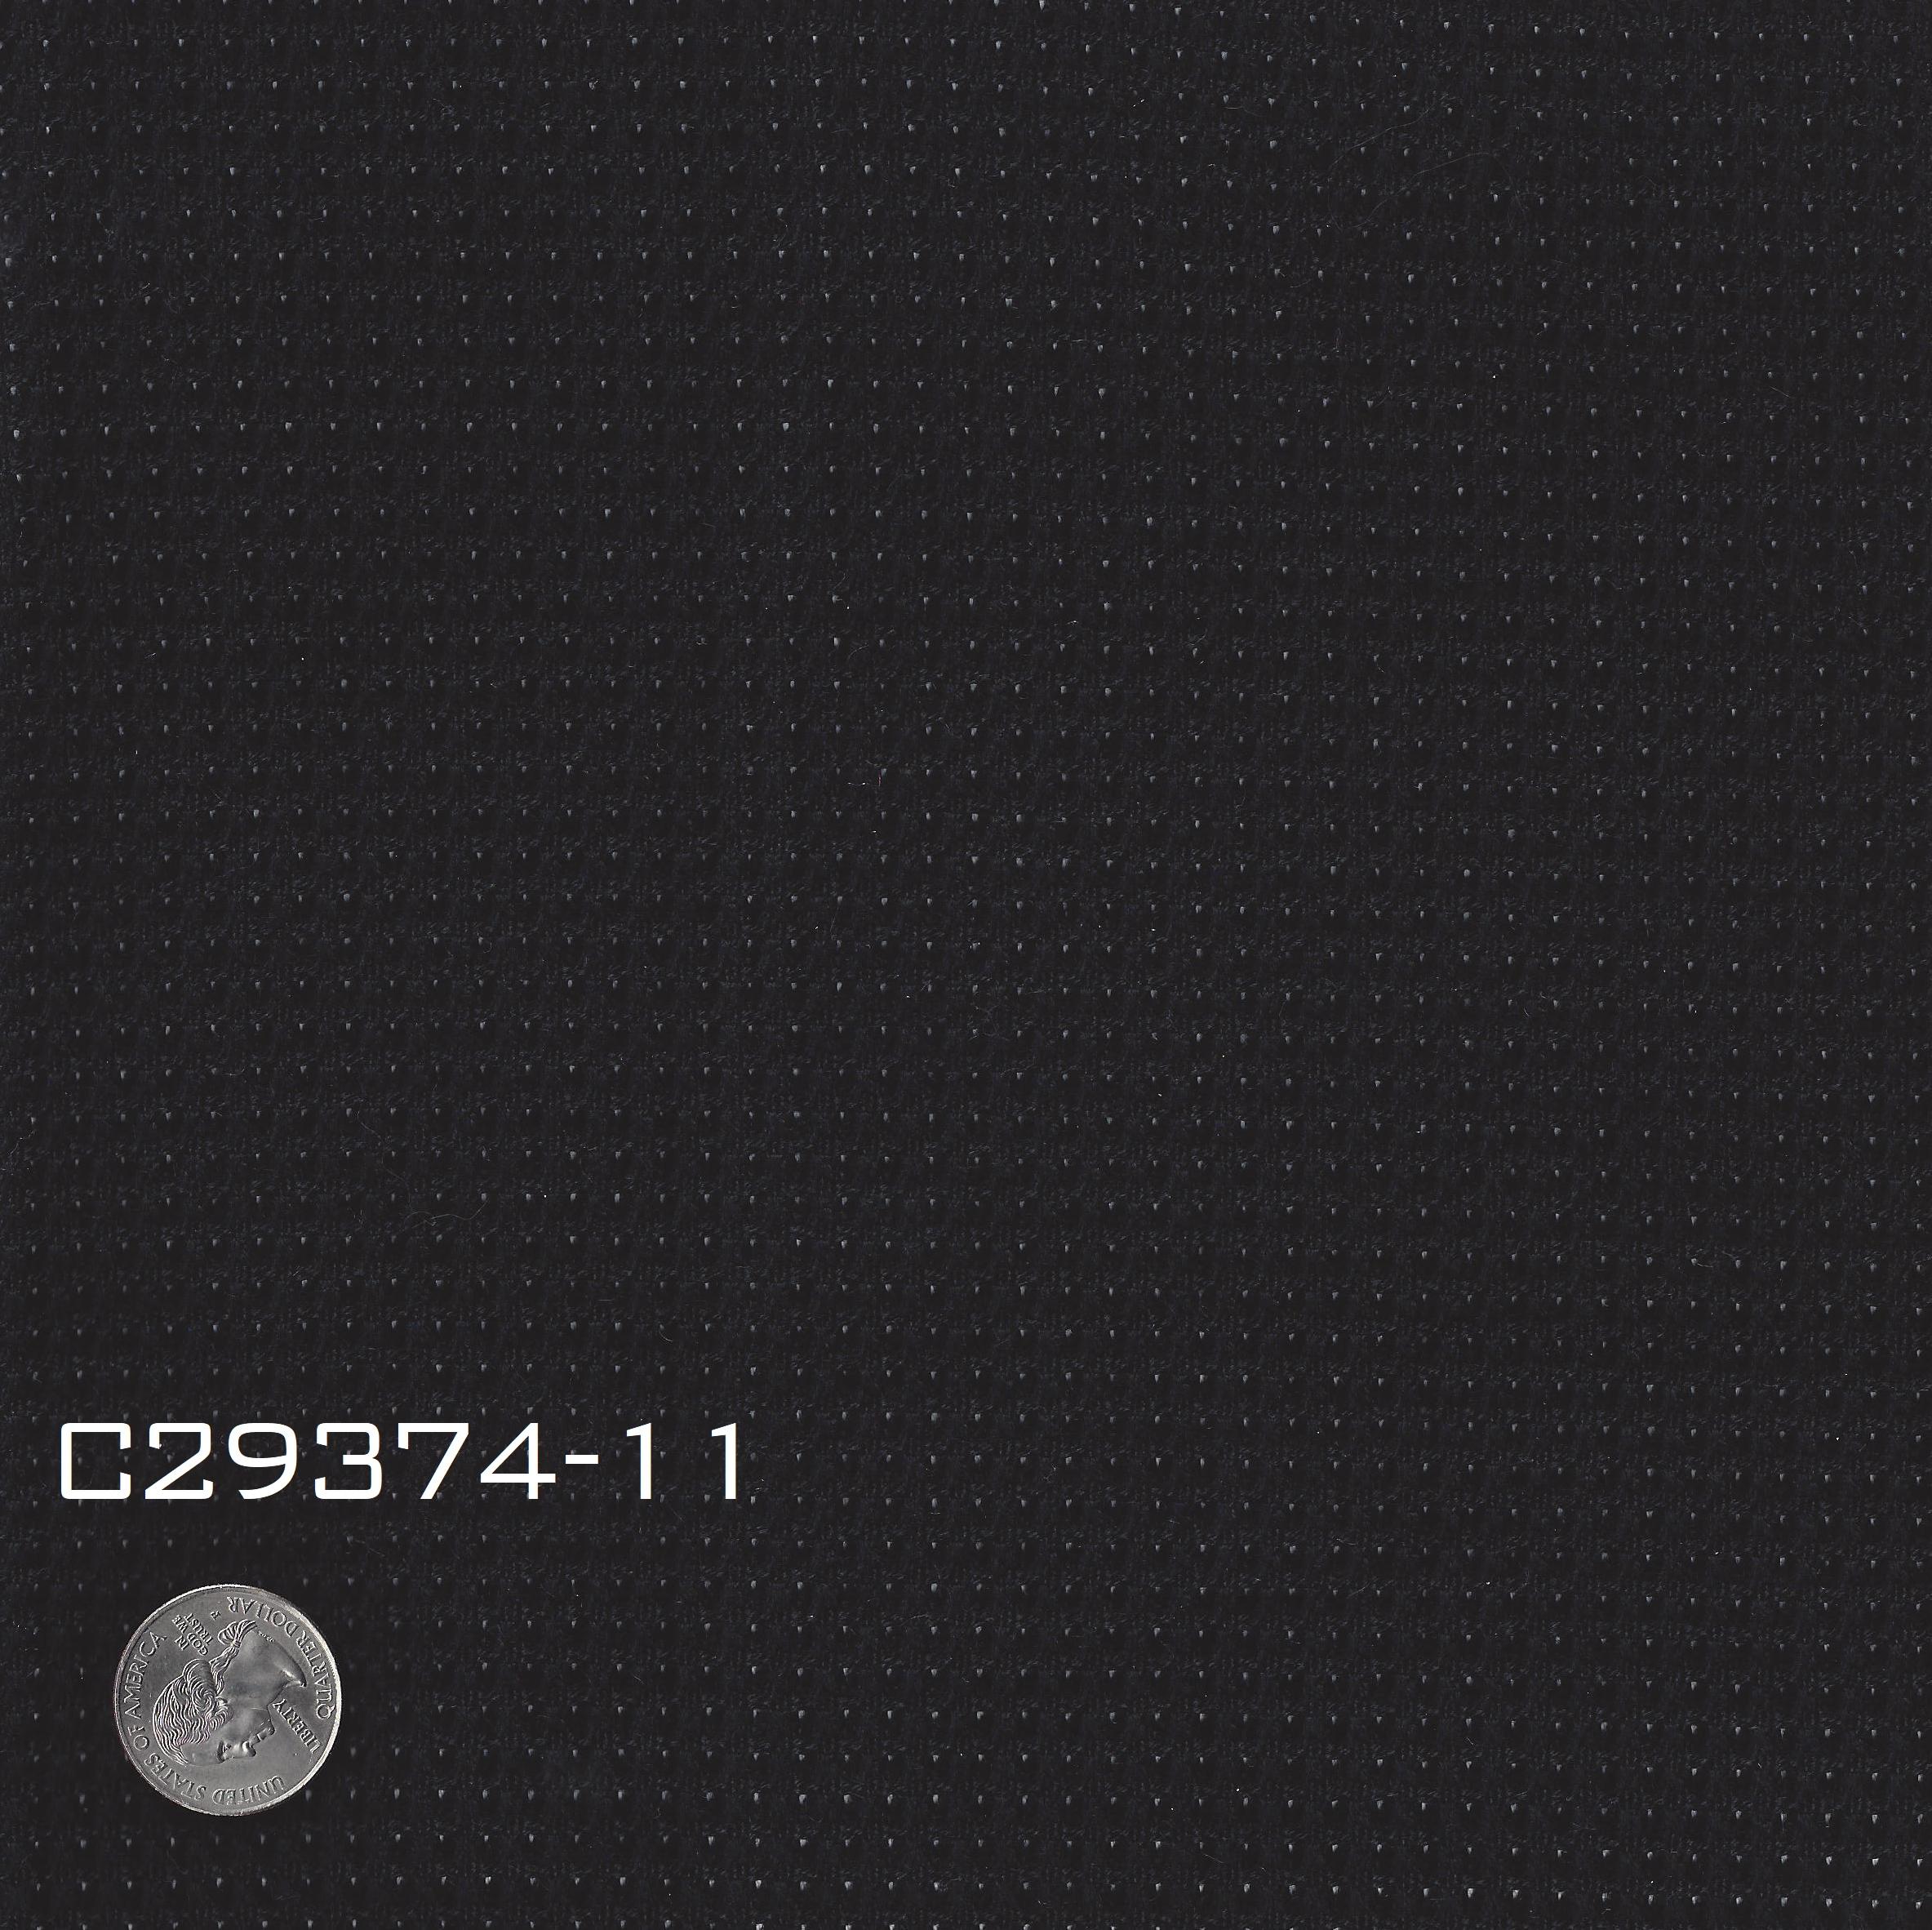 C29374-11